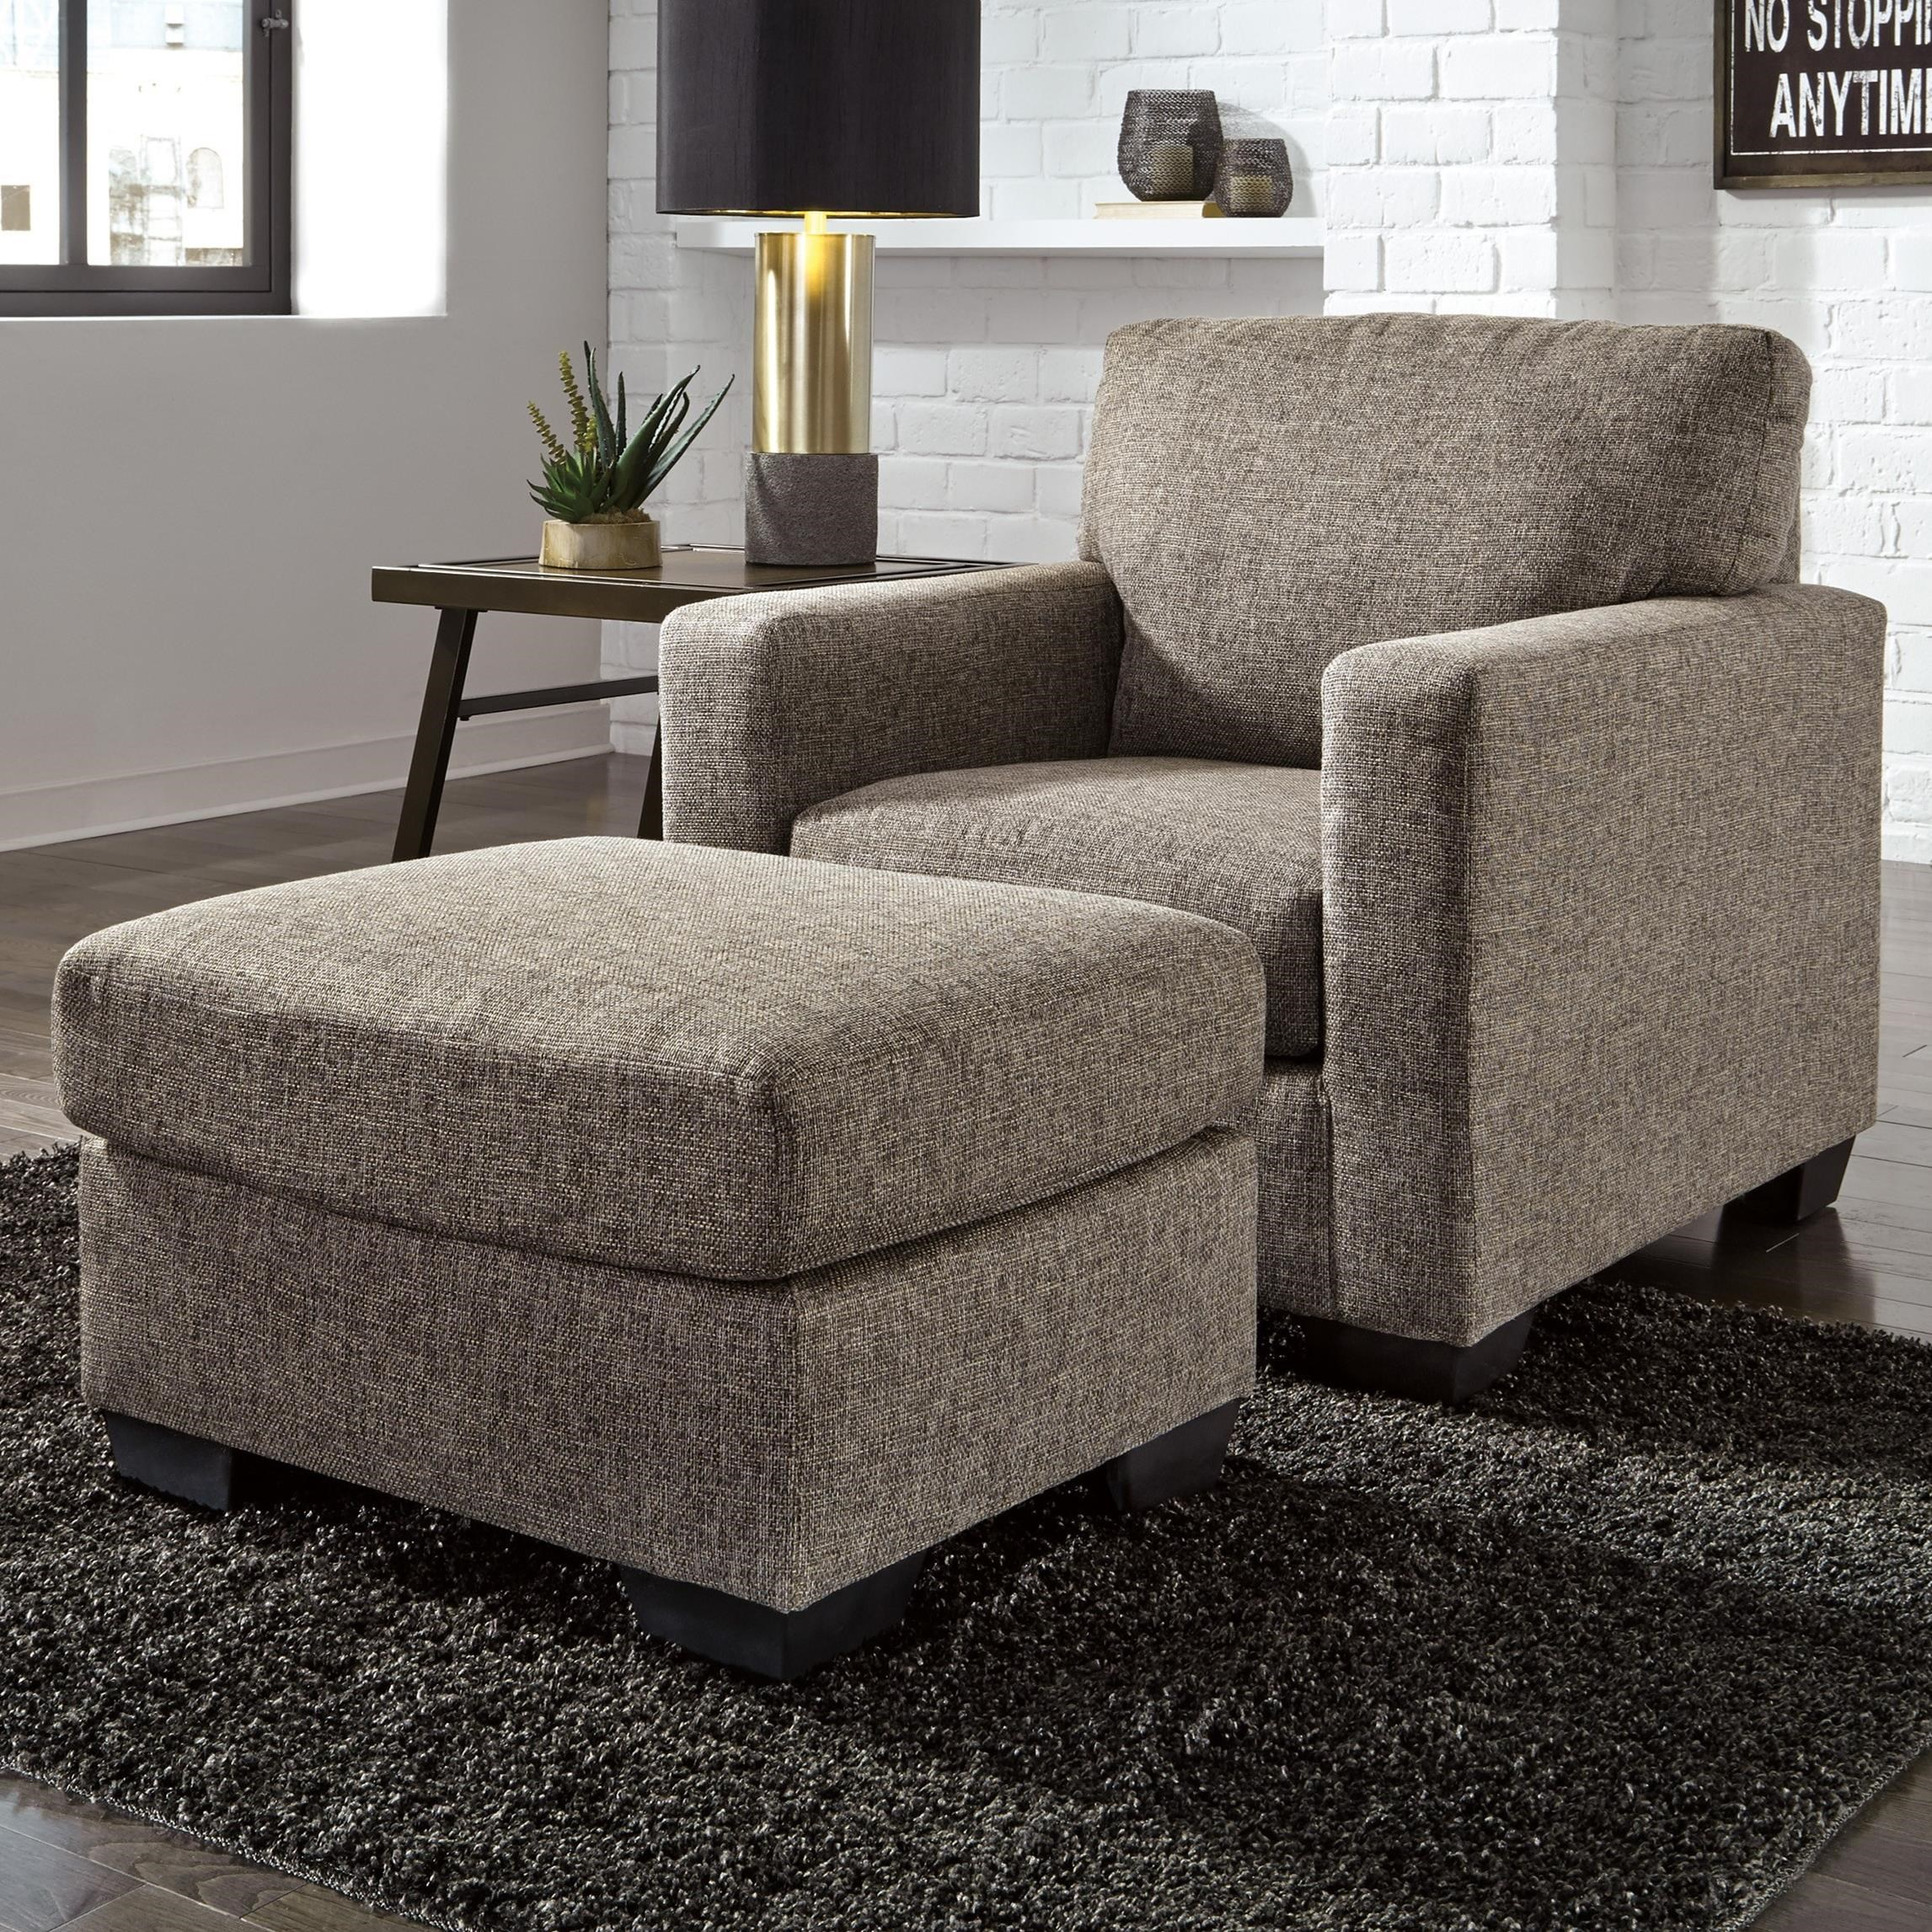 Ashley Furniture Hearne Contemporary Chair & Ottoman Household